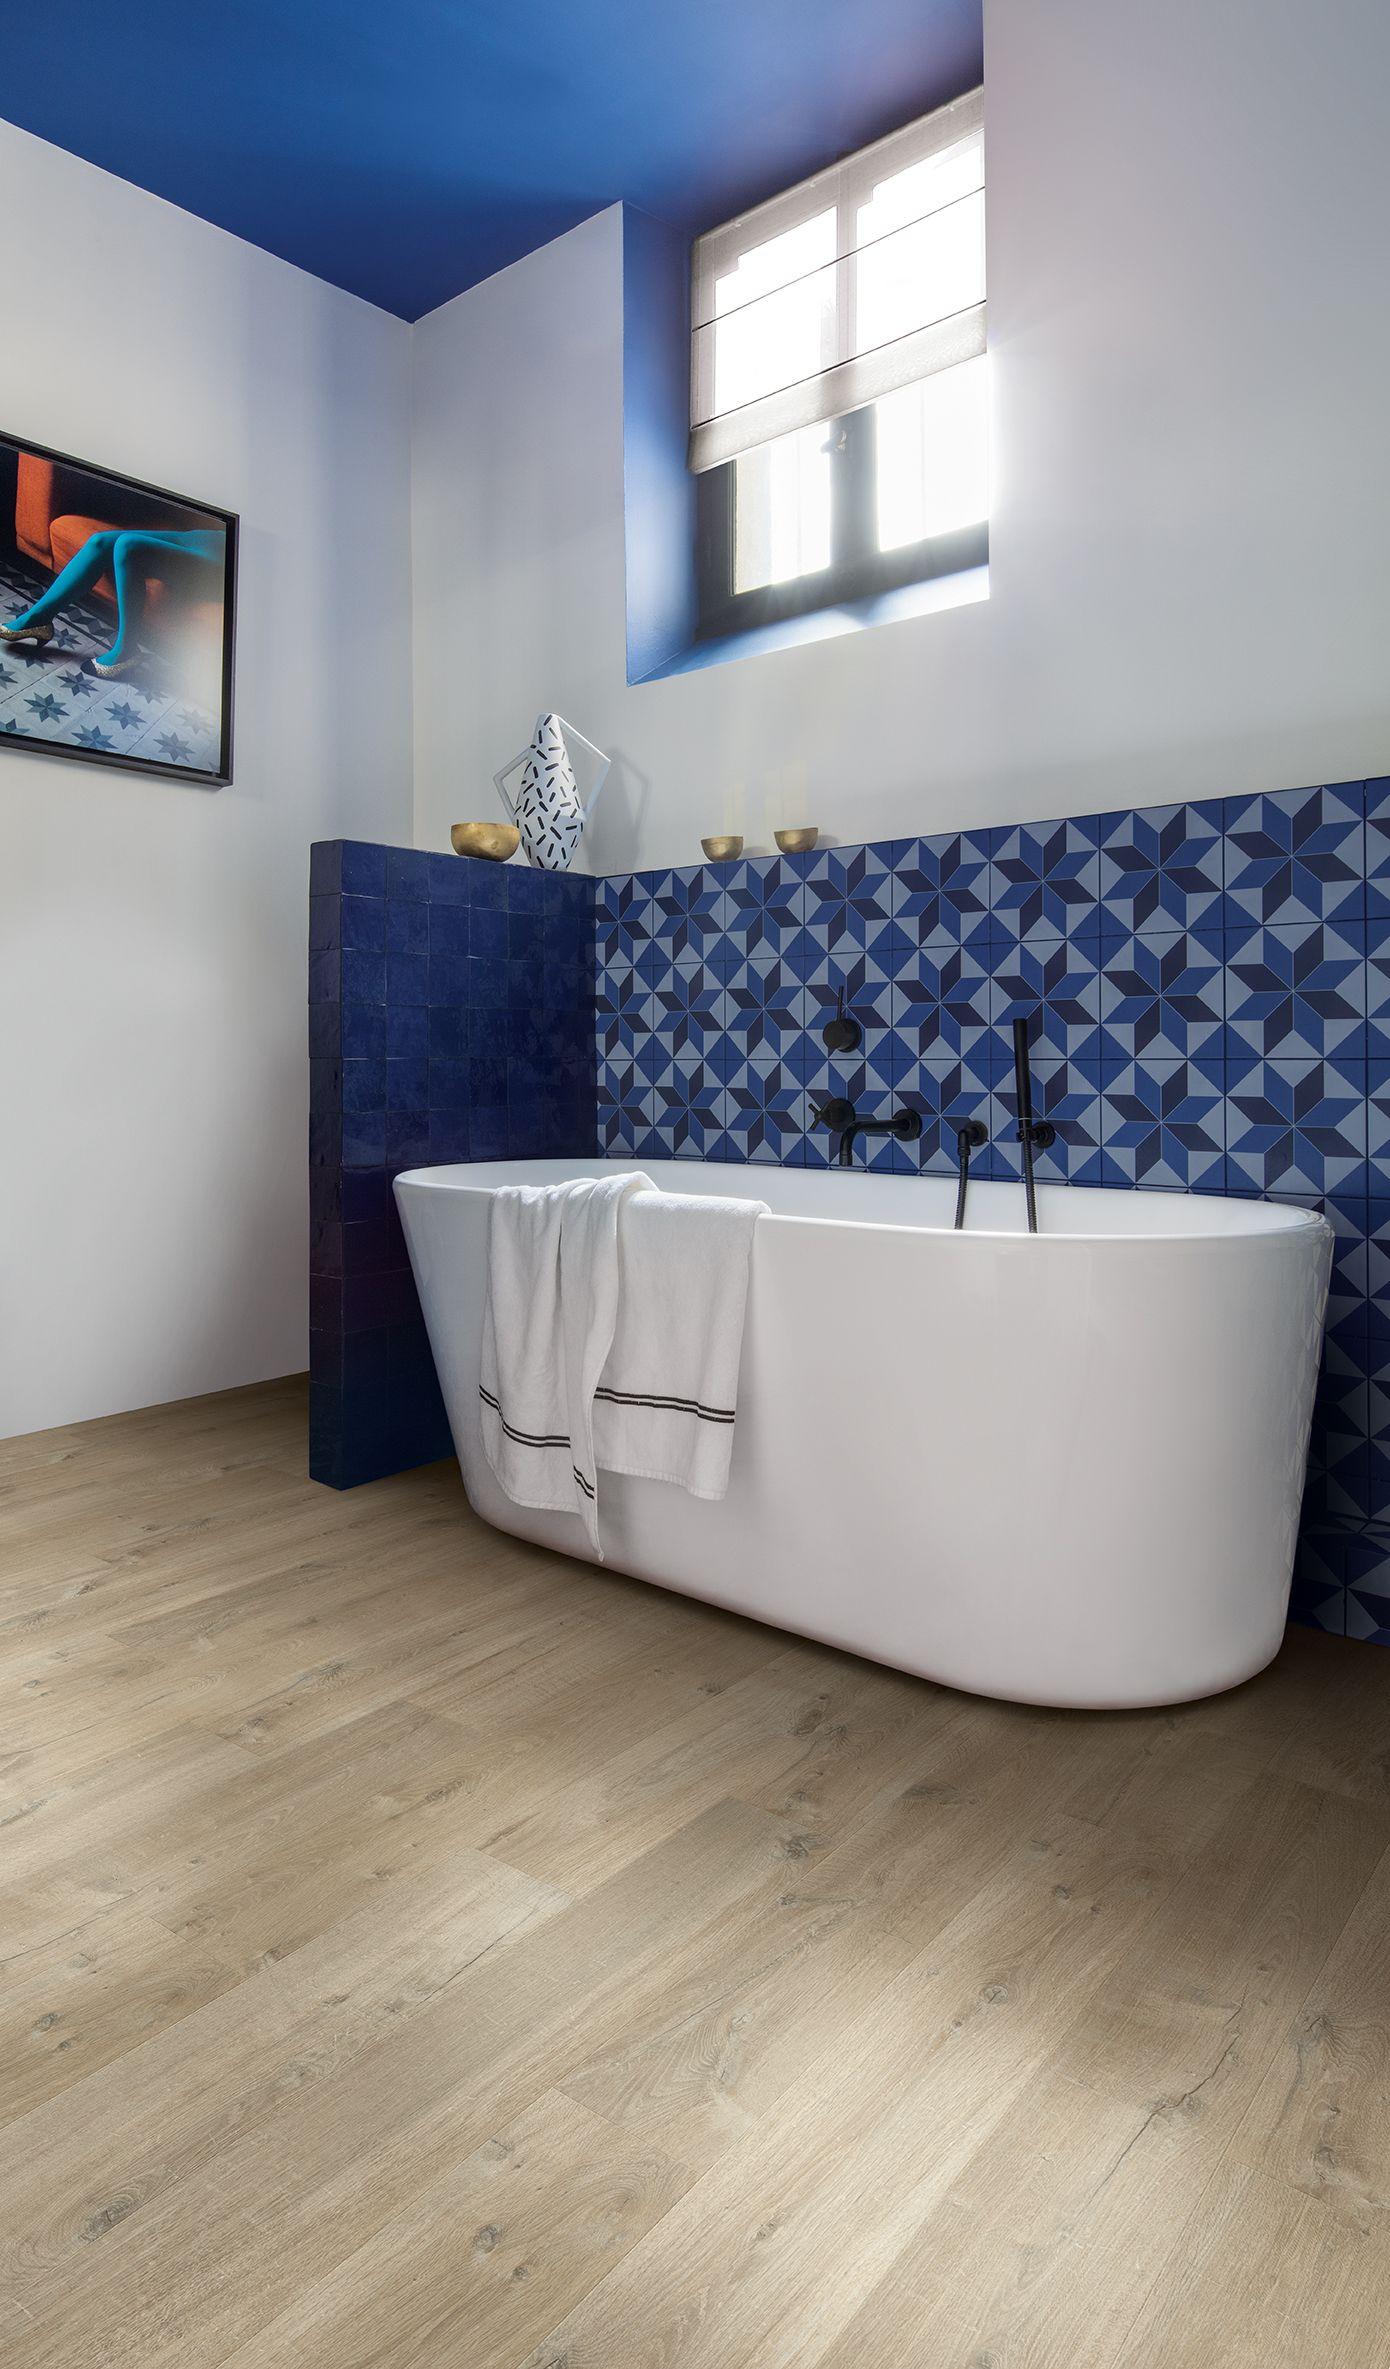 Quick Step Laminate Flooring   Impressive U0027Soft Oak Light Brownu0027 (IM3557)  In A Classic Bathroom. To Find More Bathroom Inspiration, Visit Our  Website: ...